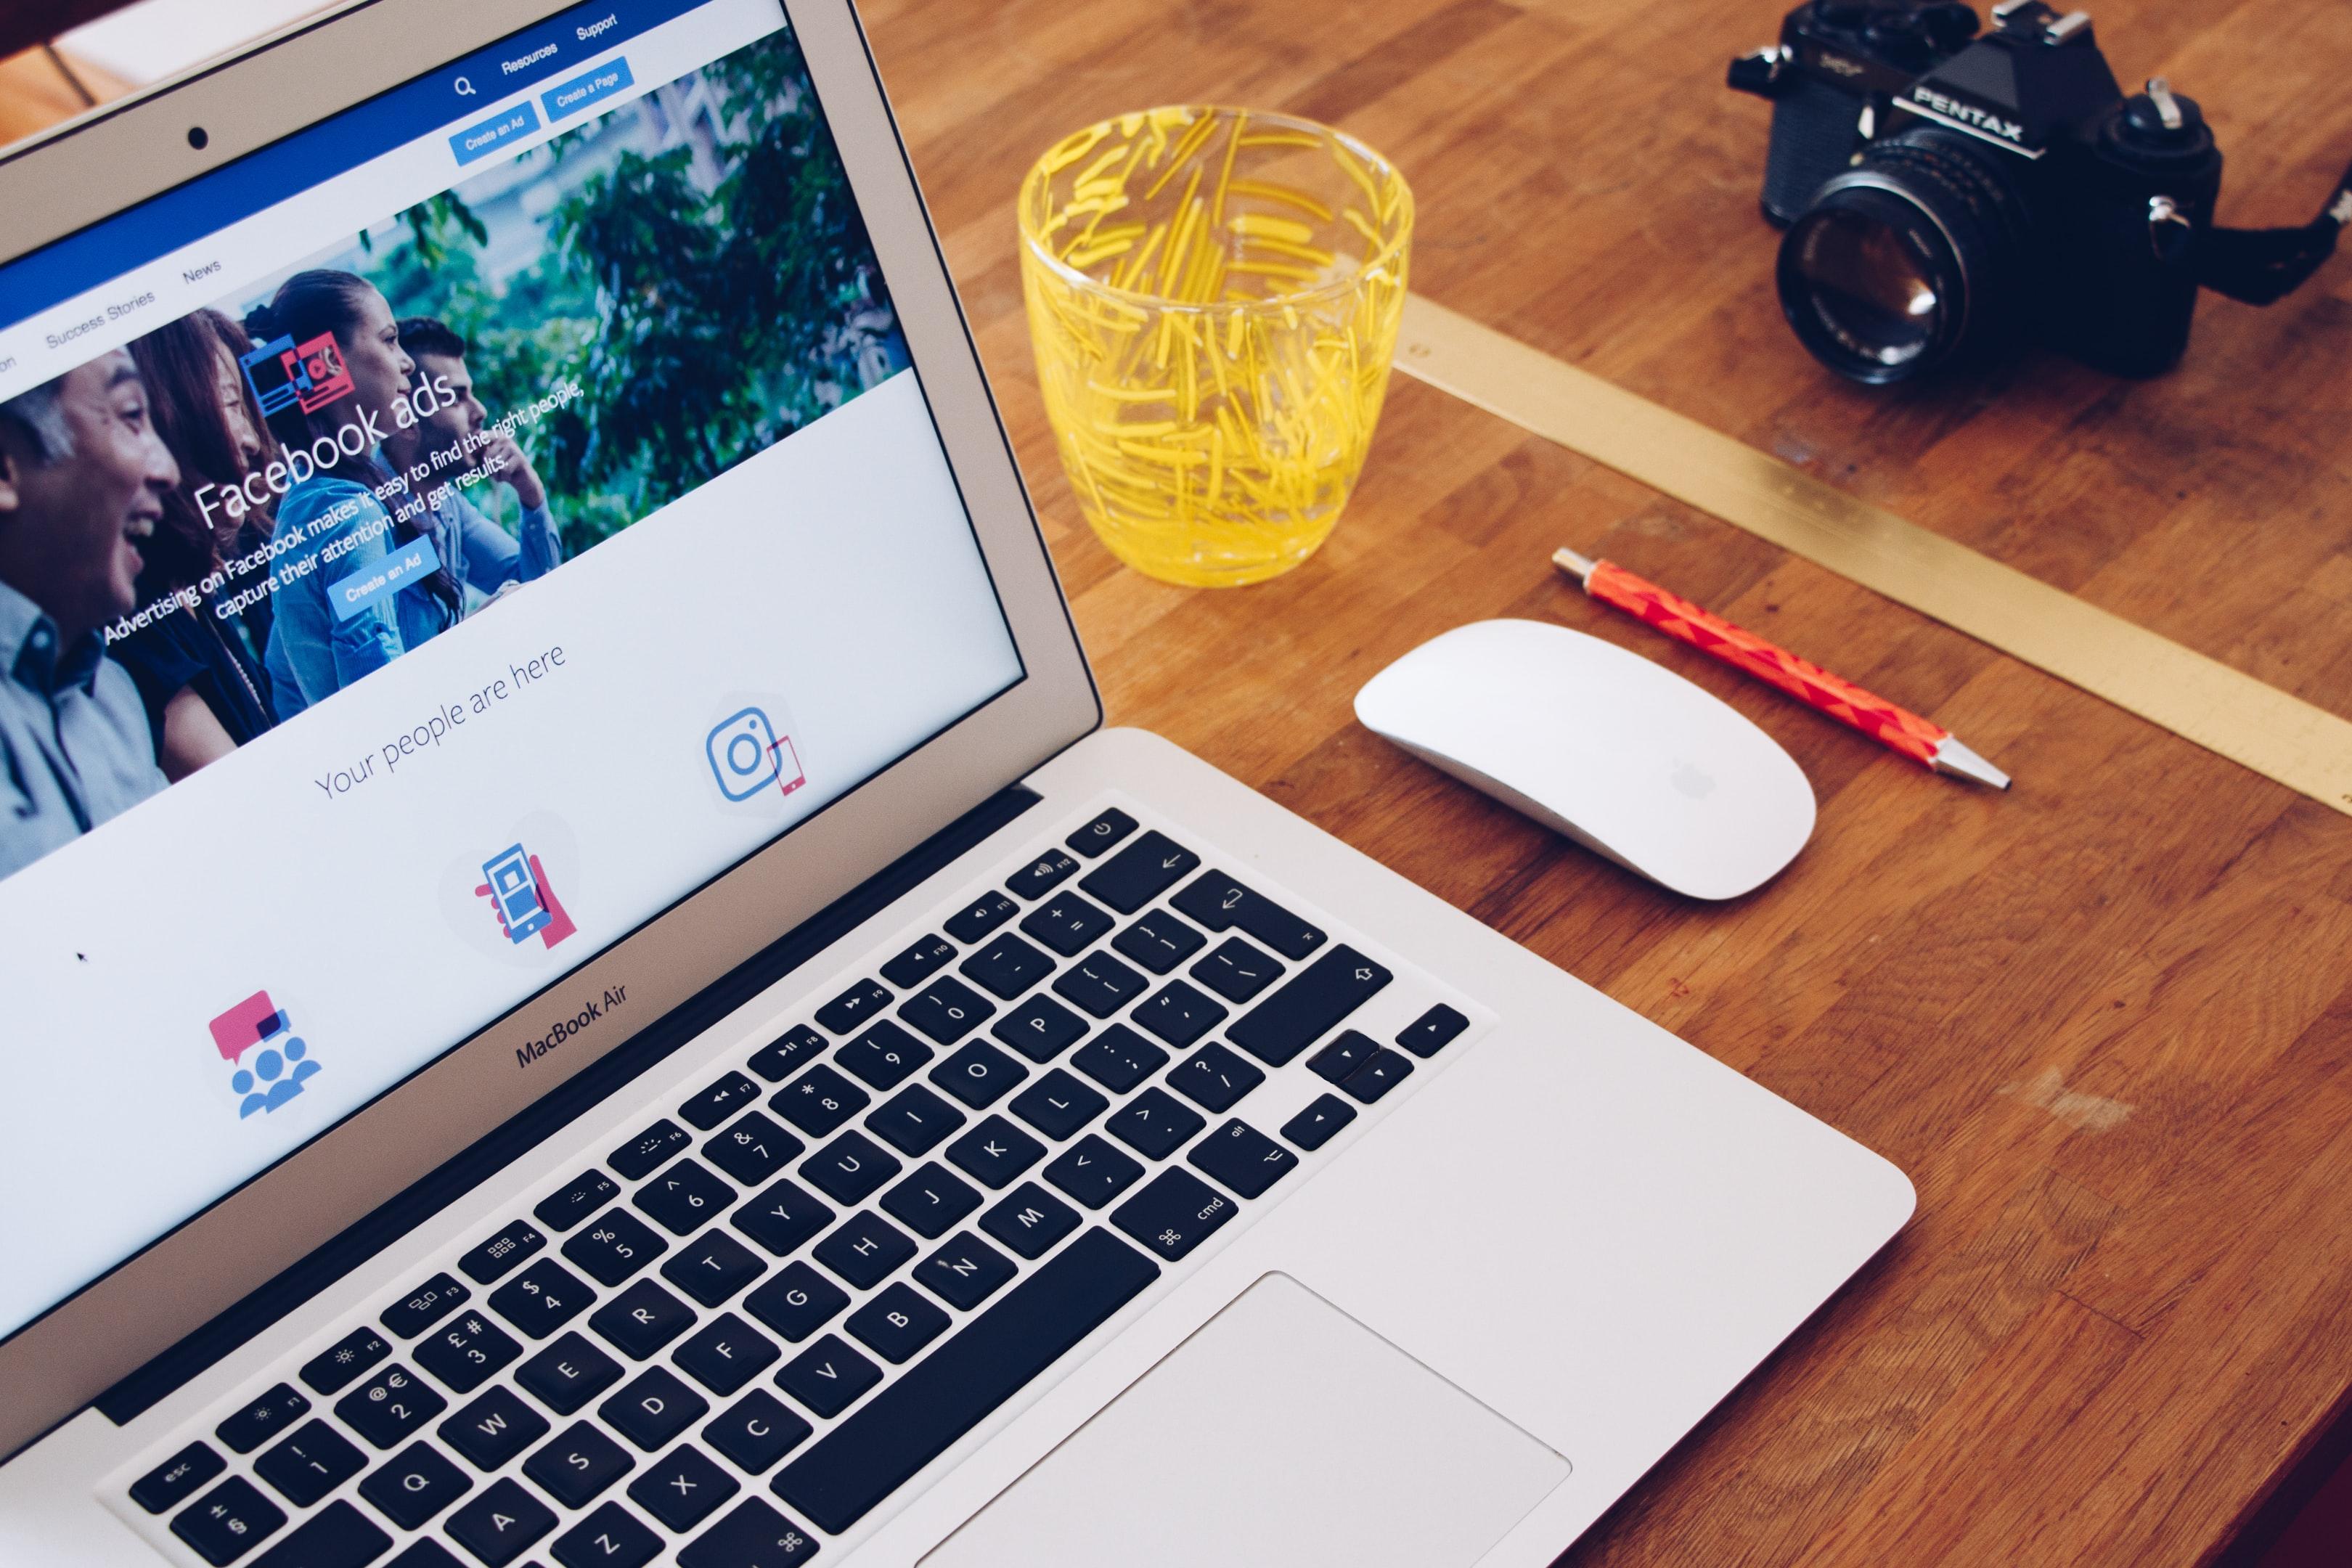 Facebook ads on a laptop